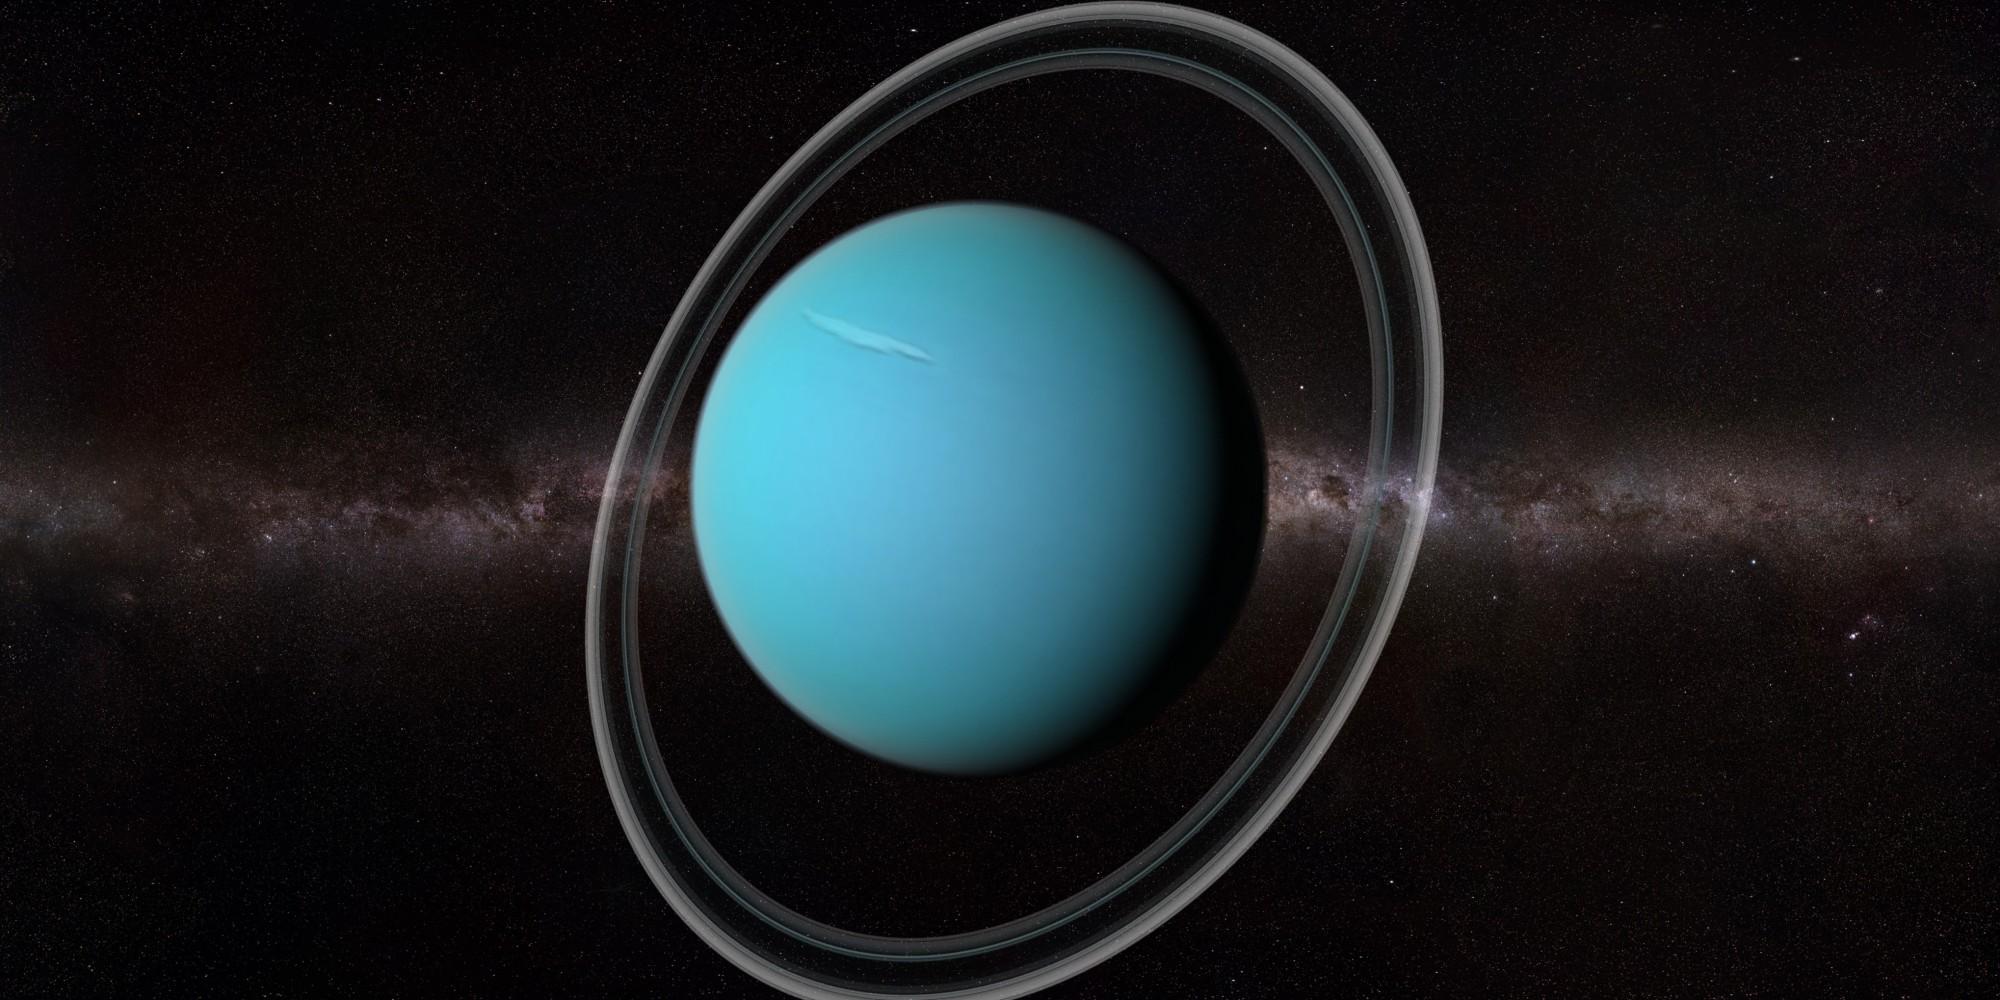 the solar planet uranus moons - photo #24